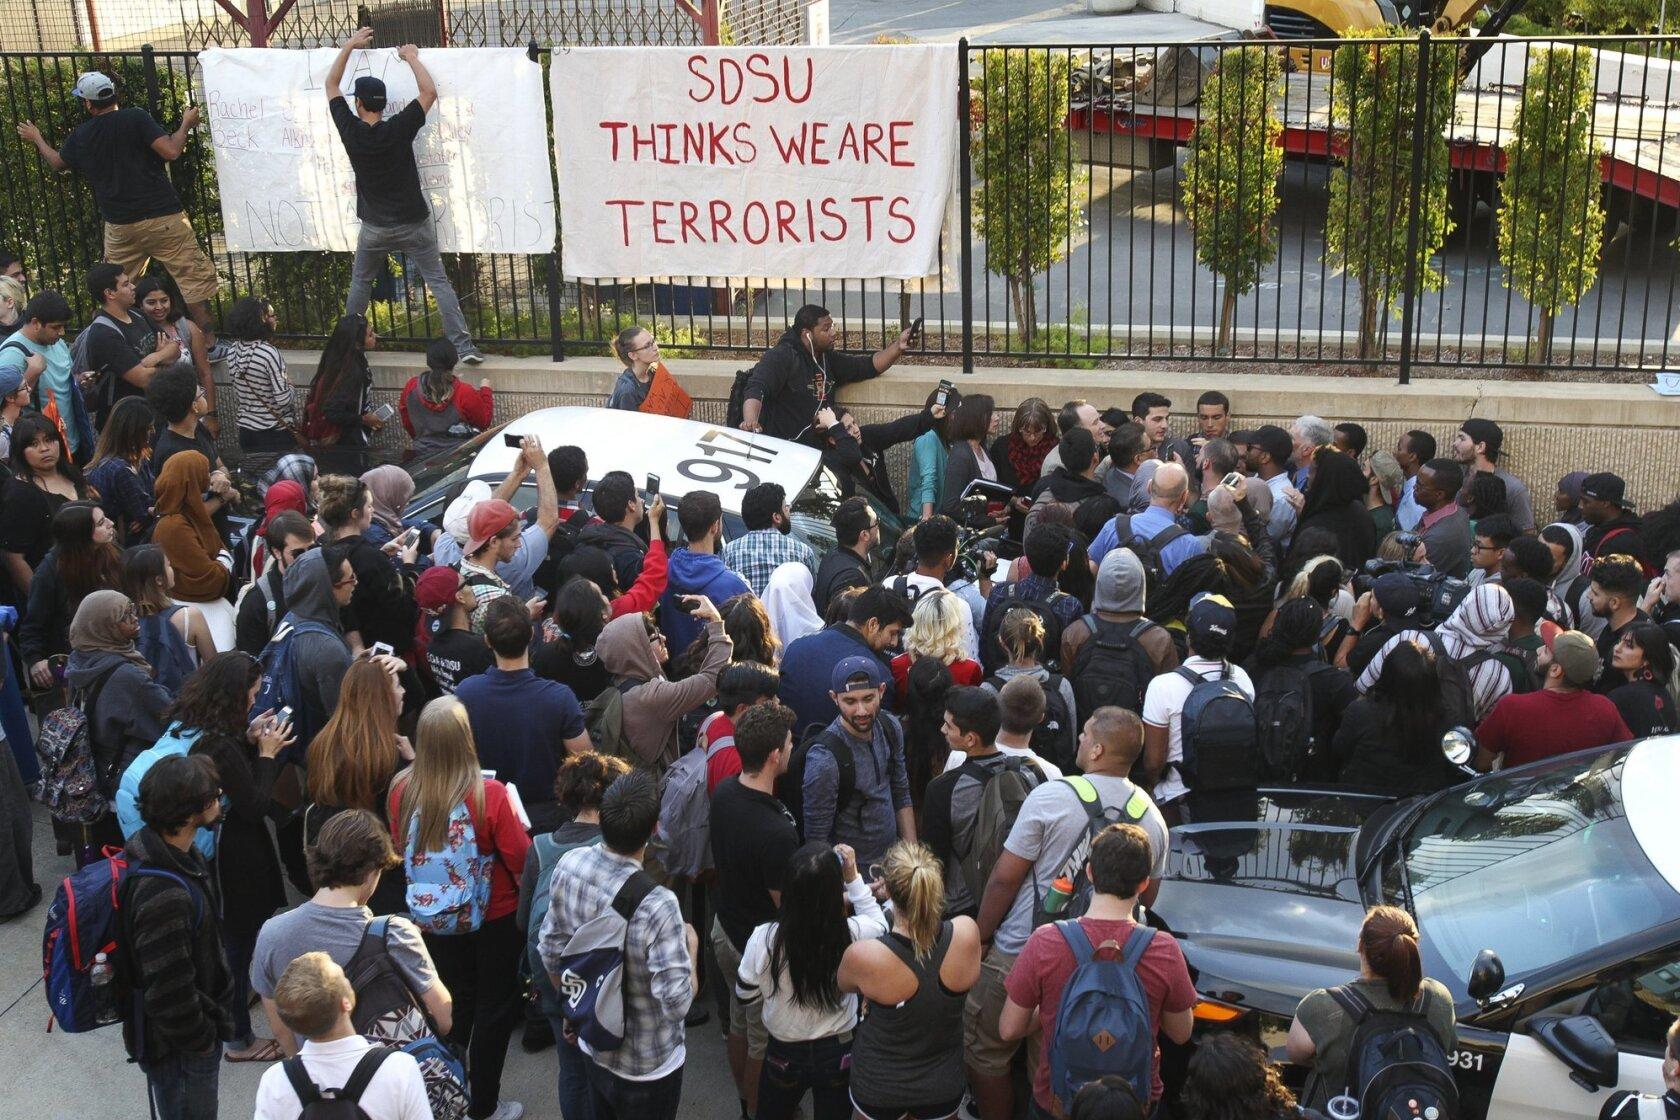 Terrorism' fliers spark SDSU protest - The San Diego Union-Tribune